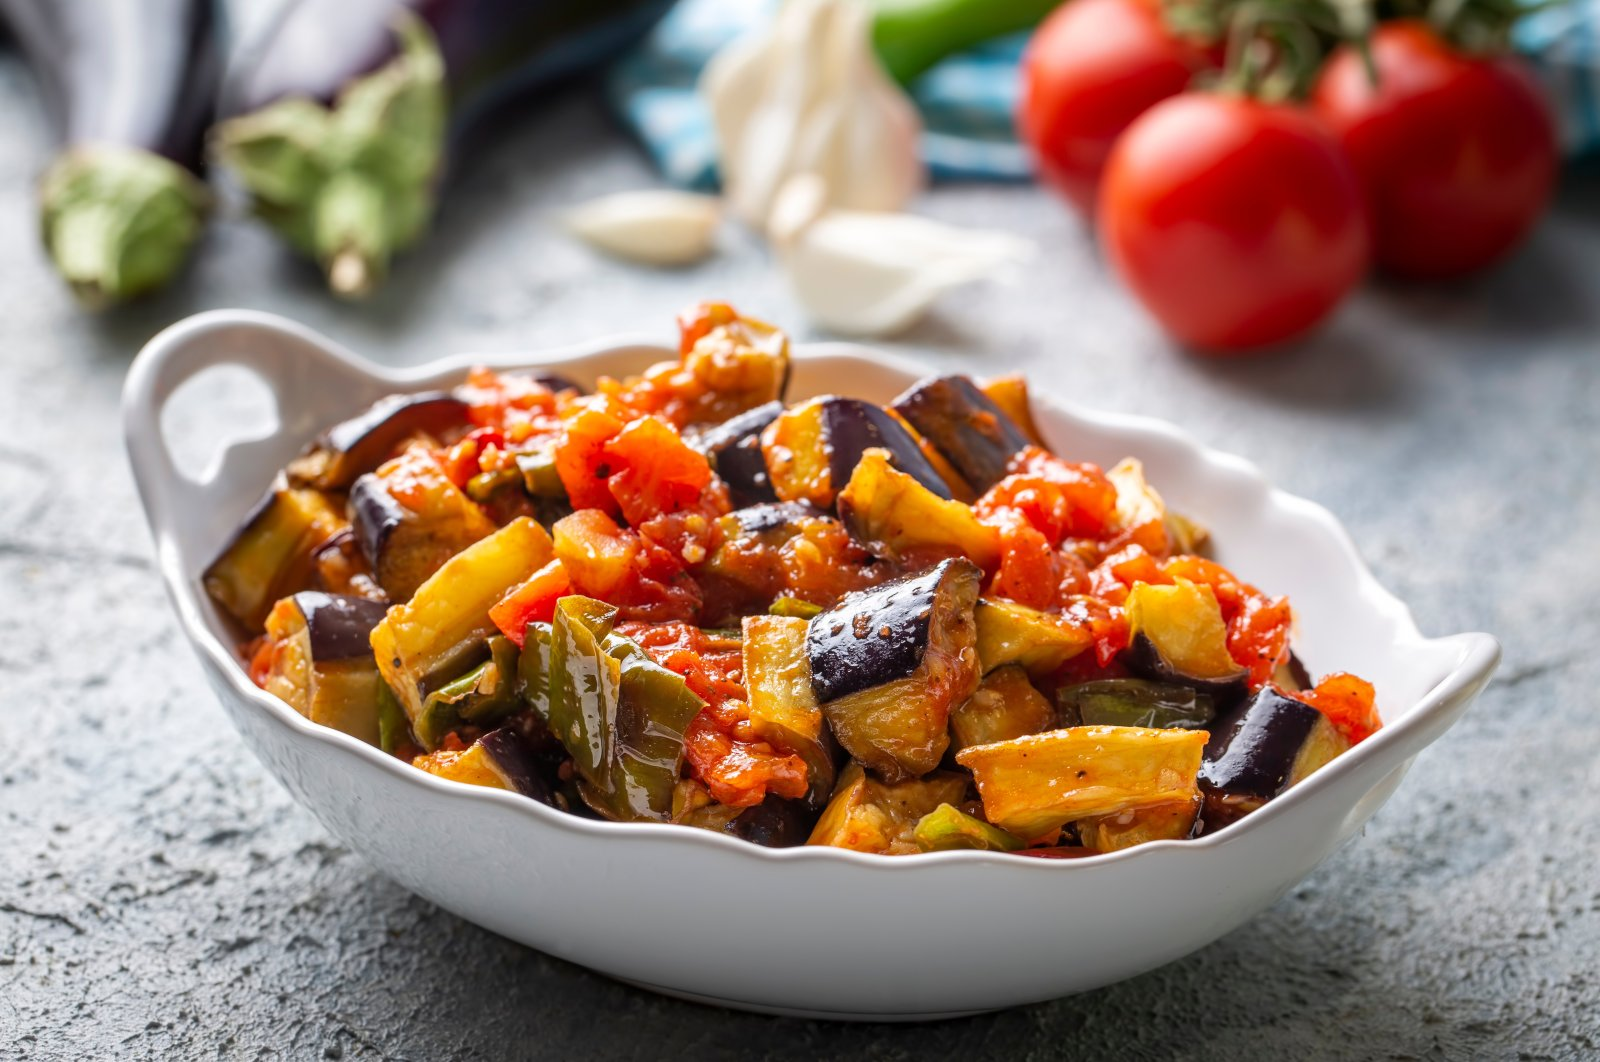 Traditional Turkish dish Şakşuka. (Shutterstock Photo)